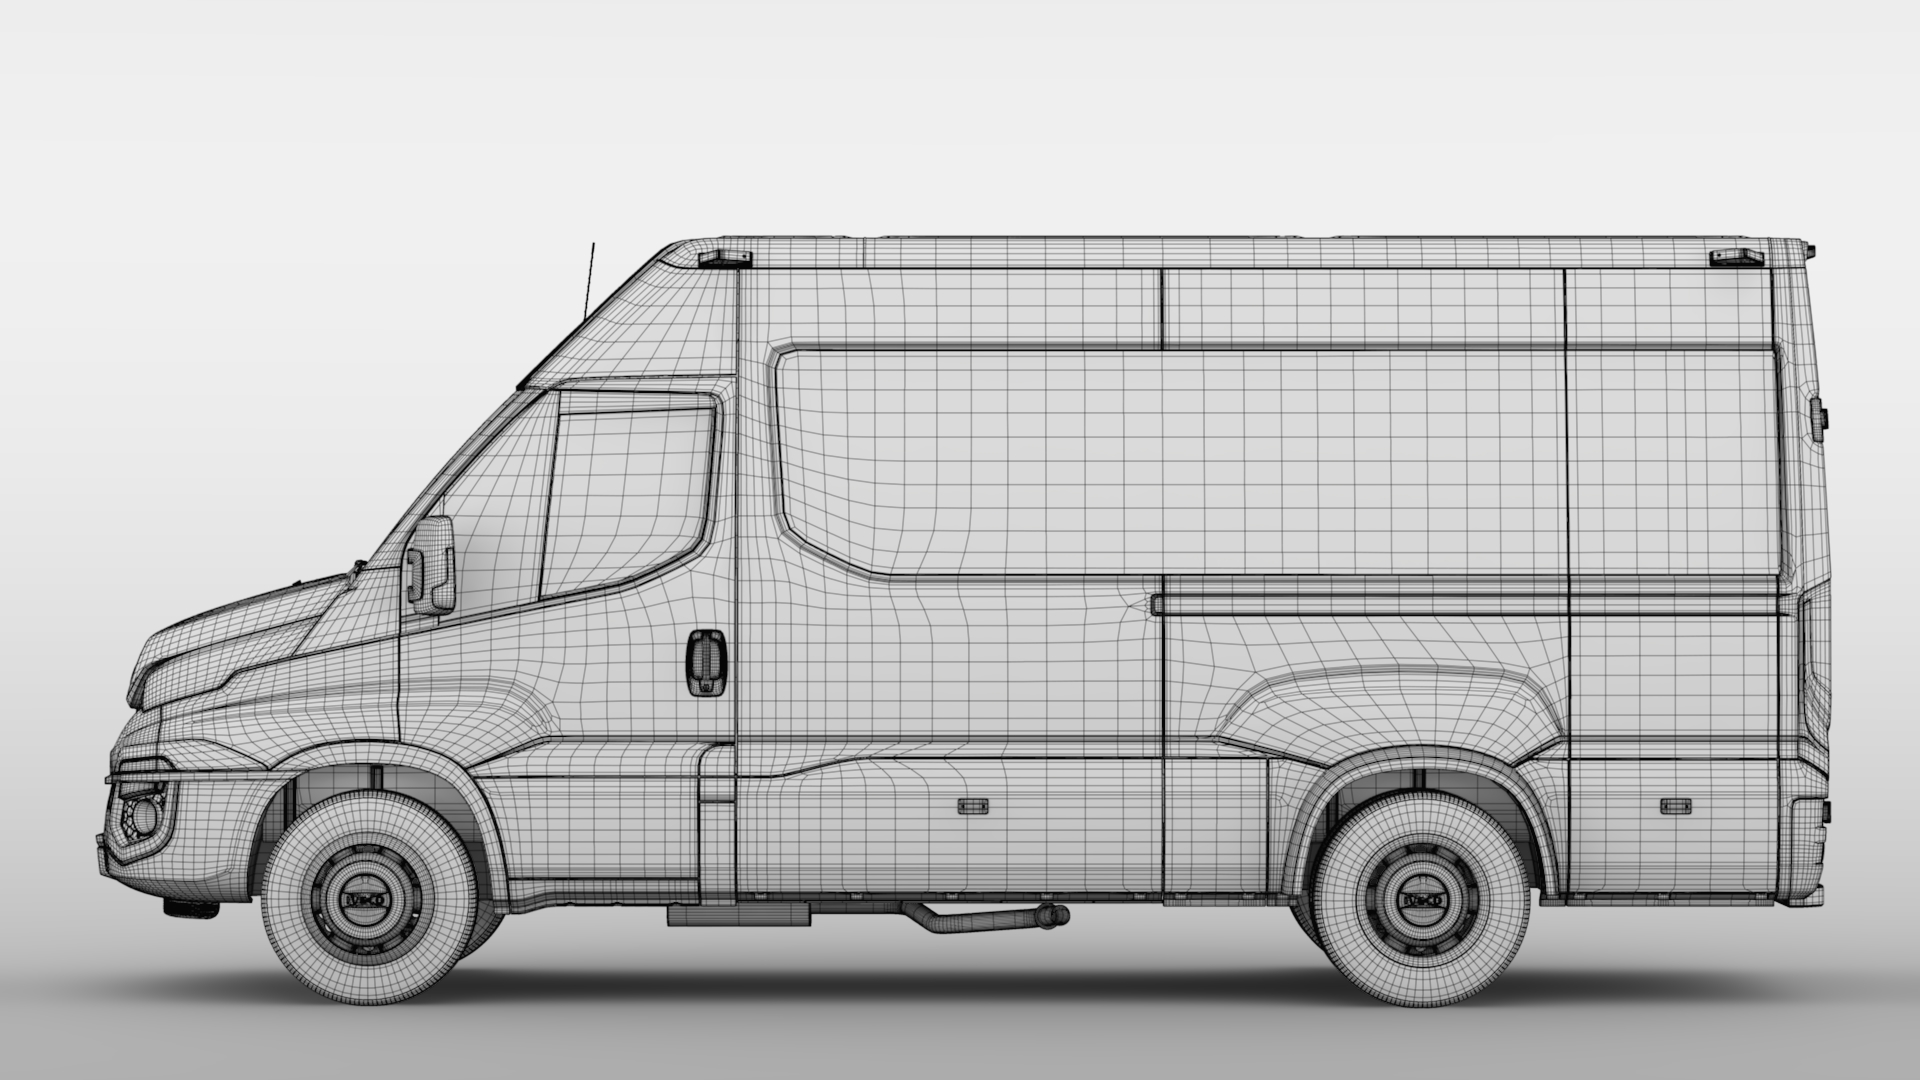 iveco daily minibus l3h2 2014-2016 3d model max fbx c4d lwo ma mb hrc xsi obj 276059